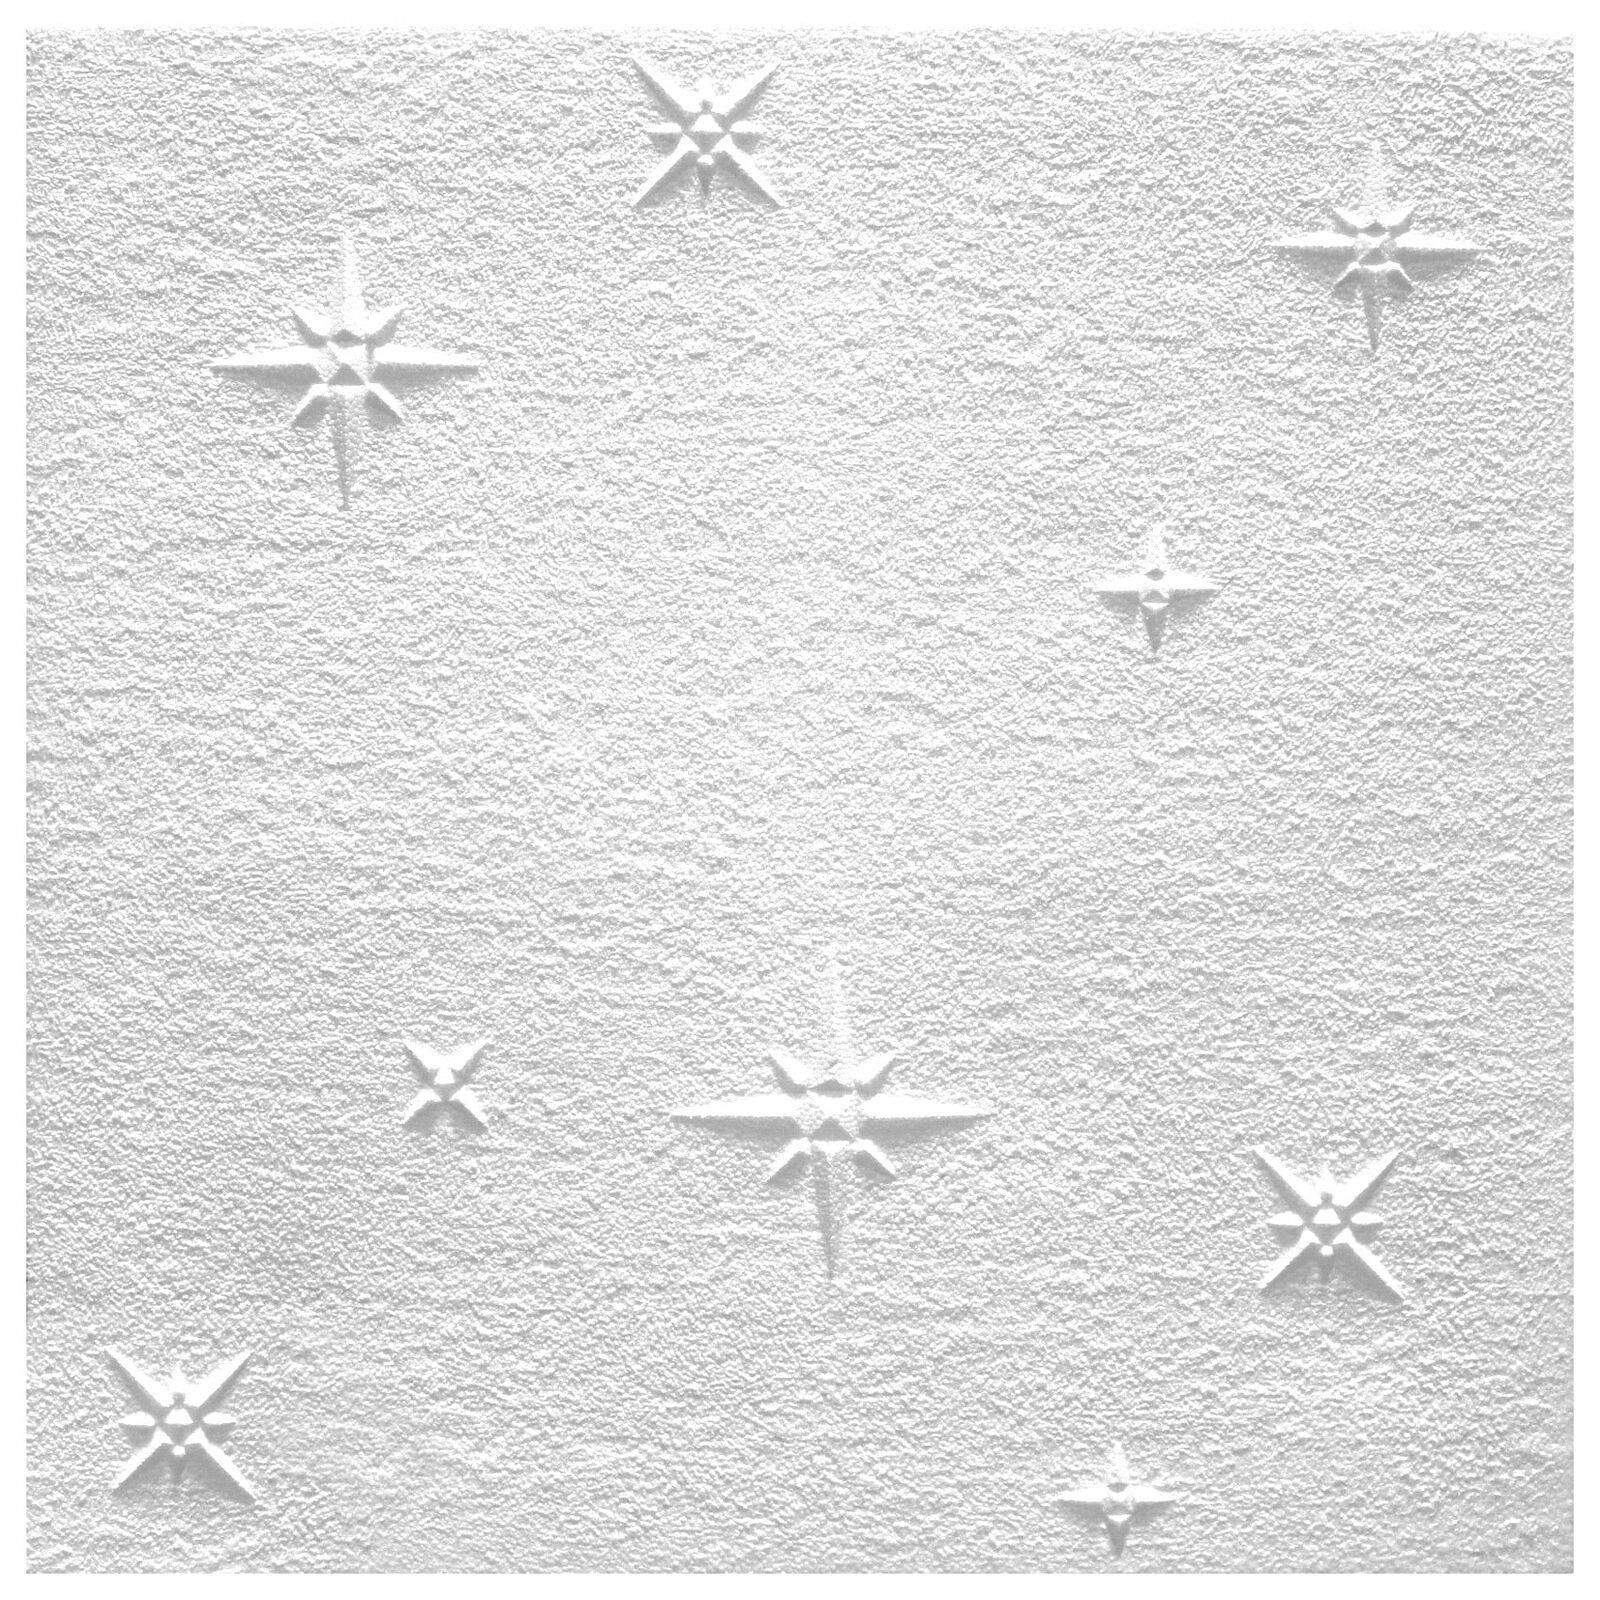 10 Qm Deckenplatten Styroporplatten Dekorplatten Eps Deckenfliesen 50x50cm Zima Eur 38 04 Dekore Desi In 2020 Styroporplatten Deckenplatten Styropor Deckenplatten